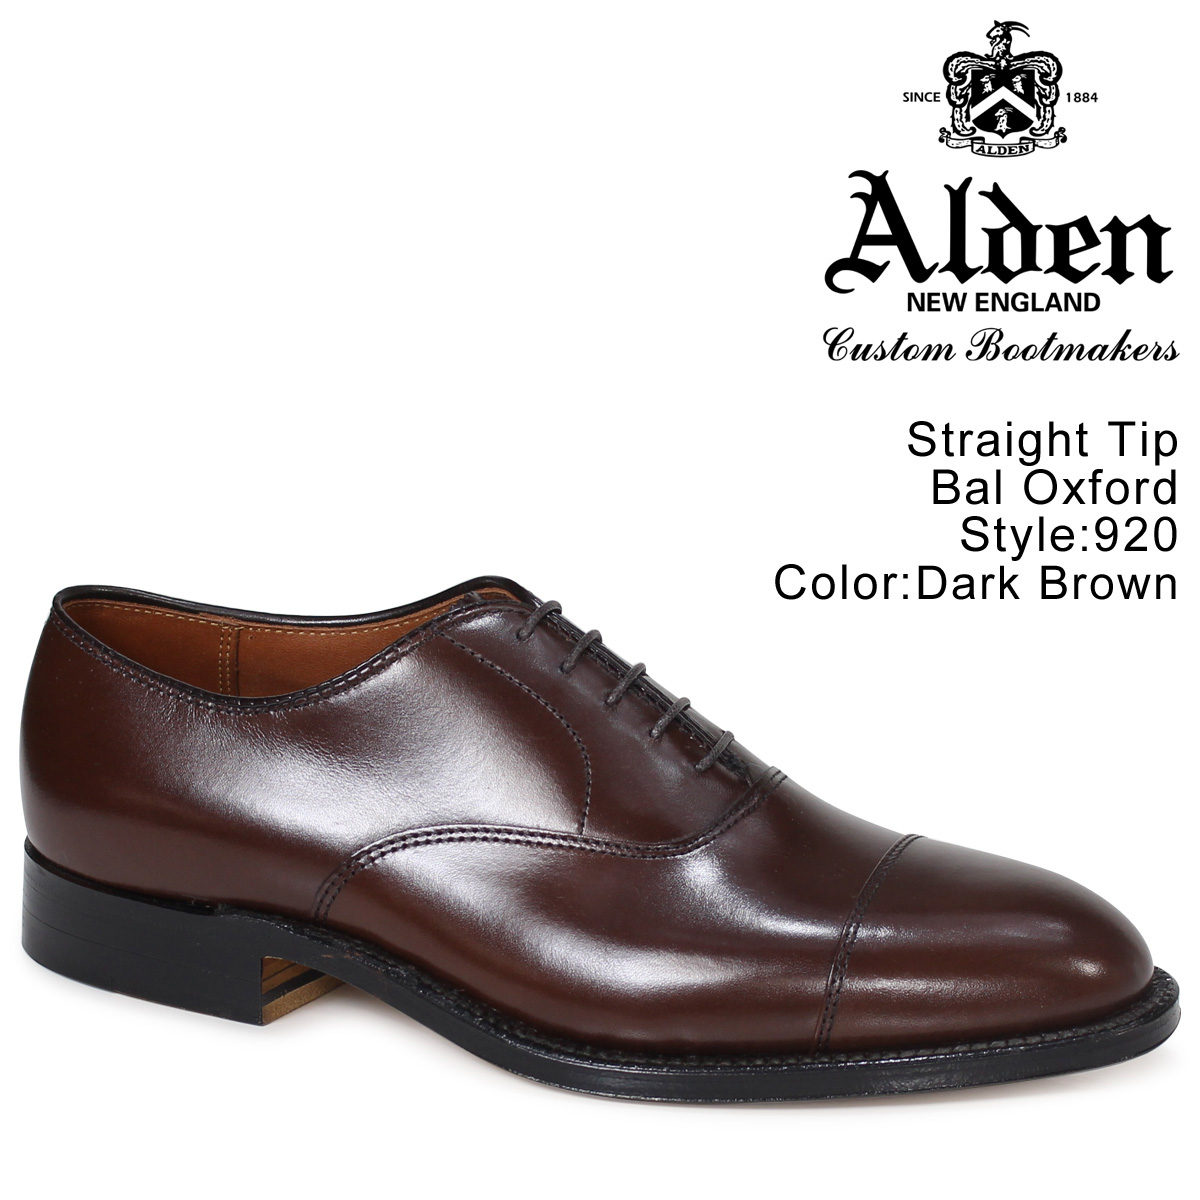 ALDEN STRAIGHT TIP BAL OXFORD オールデン オックスフォード シューズ Dワイズ 920 メンズ